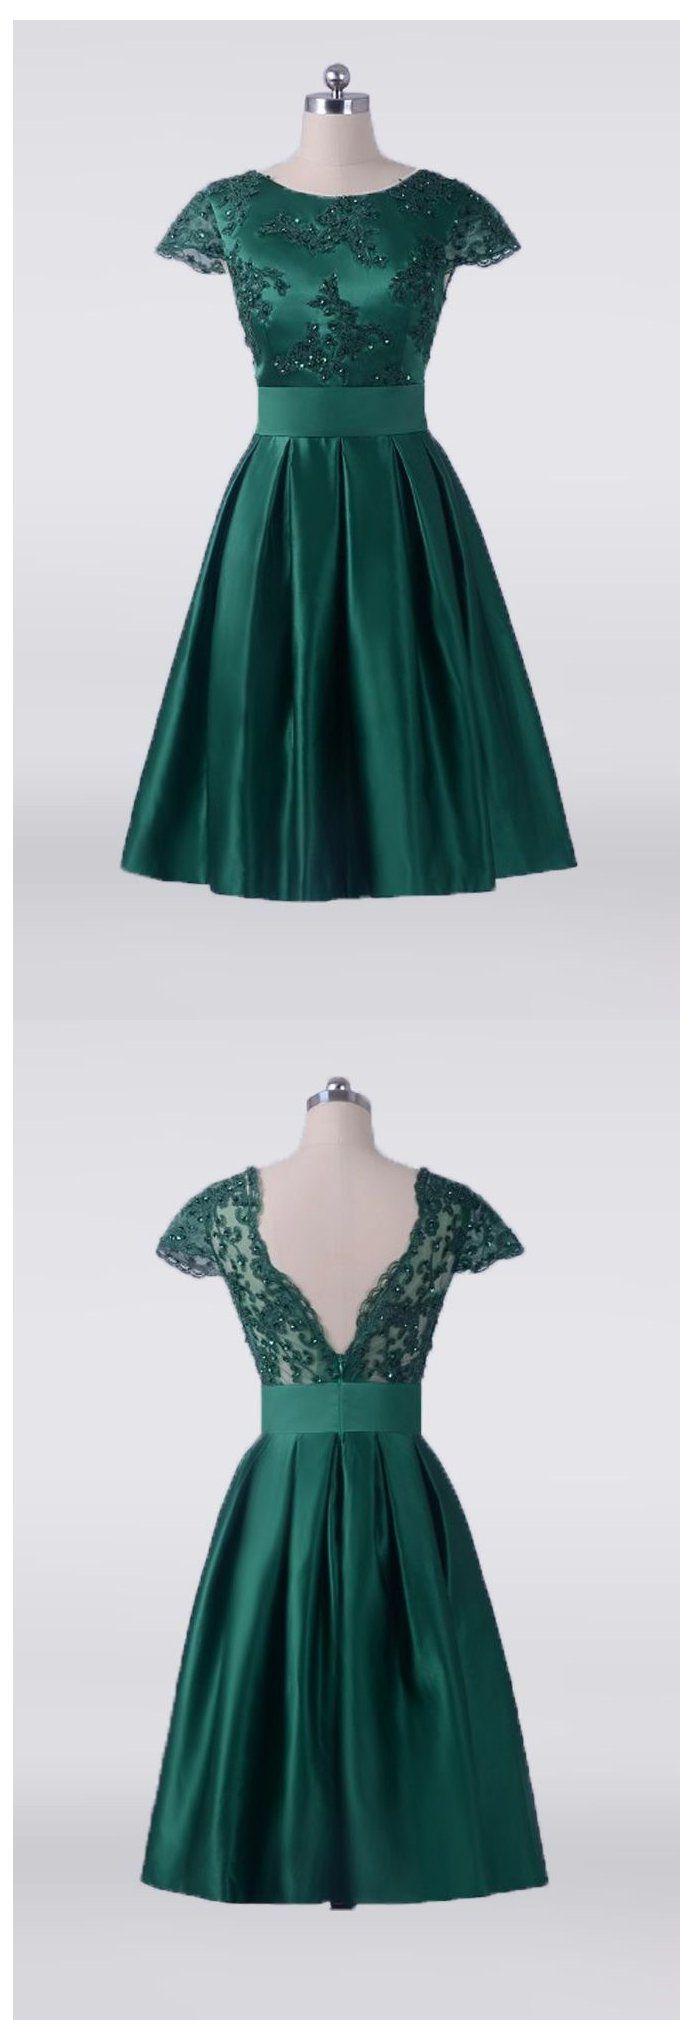 Vintage Emerald Green Short Mother Of The Bride Dress With Cap Sleeves E7949 Gemgra Short Wedding Guest Dresses Green Wedding Guest Outfits Green Prom Dress [ 2040 x 693 Pixel ]